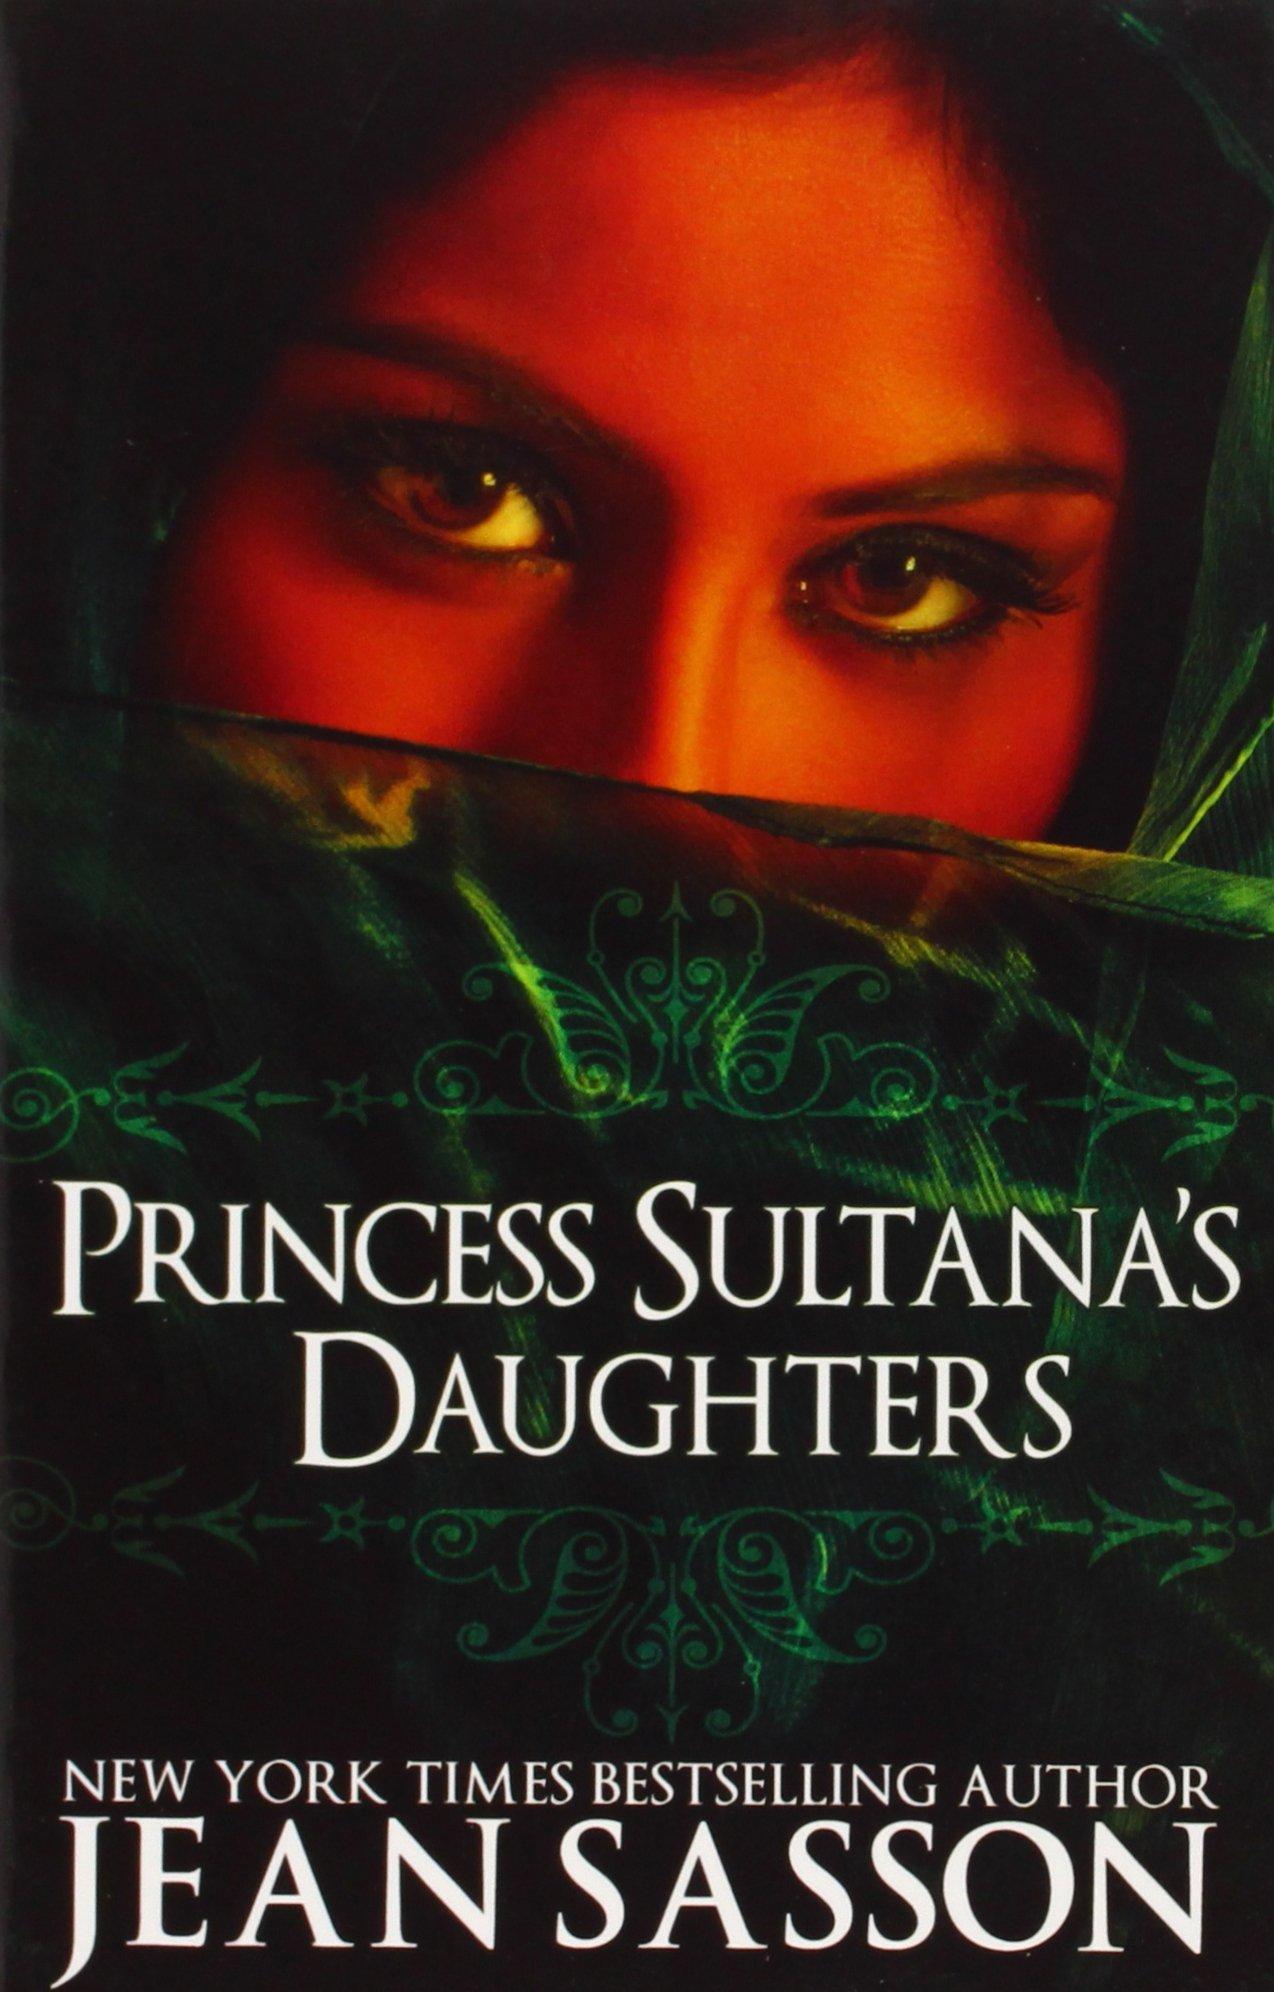 Buy Princess Sultana's Daughters: A Saudi Arabian Woman's Intimate